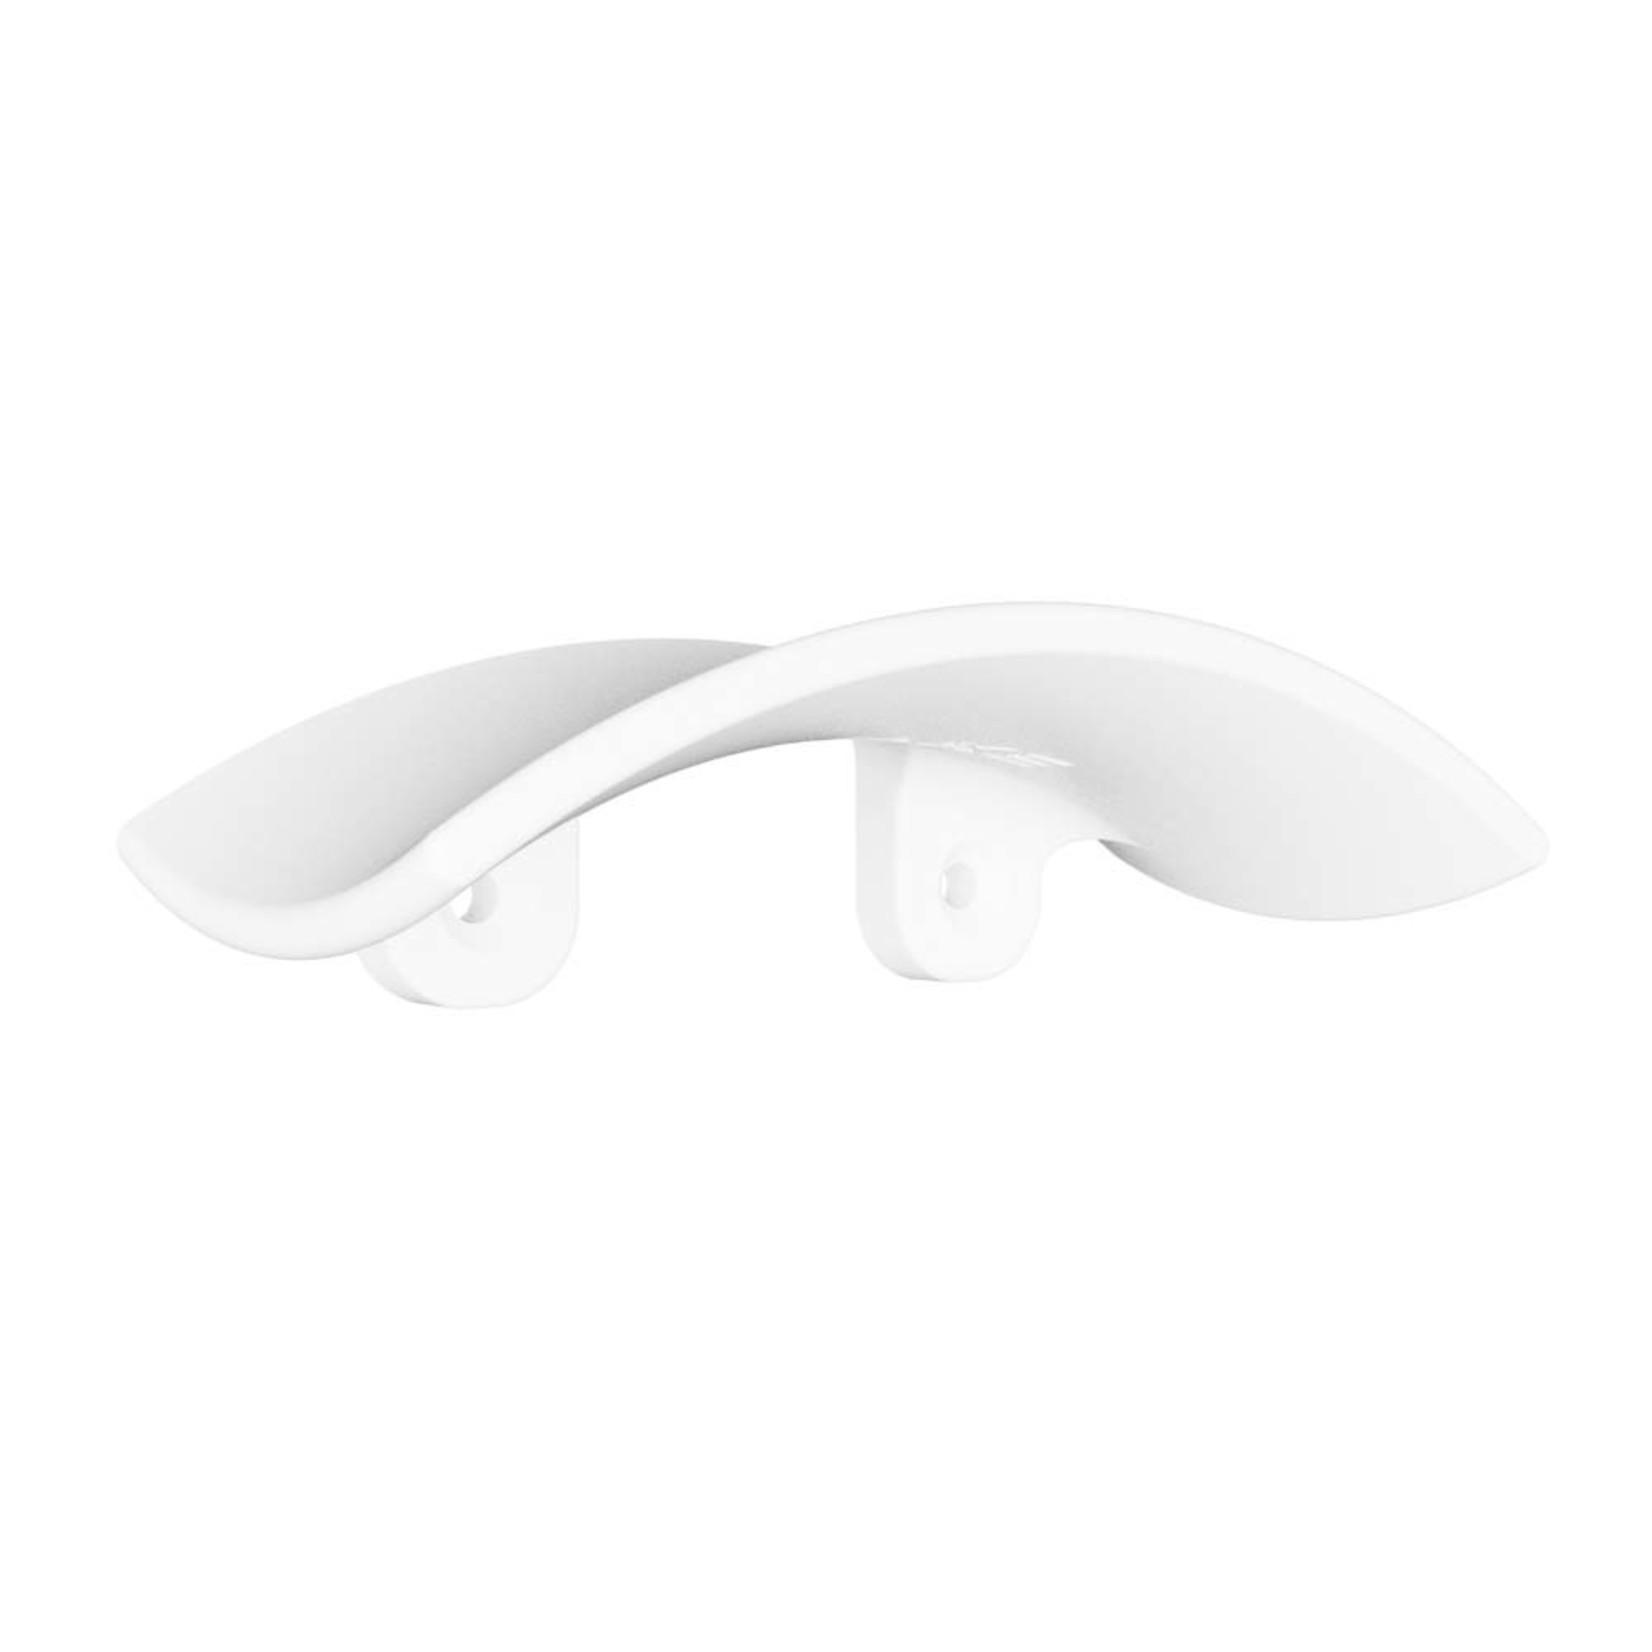 Umake Headphone Wallmount Curve   Hang up your headphone against a wall